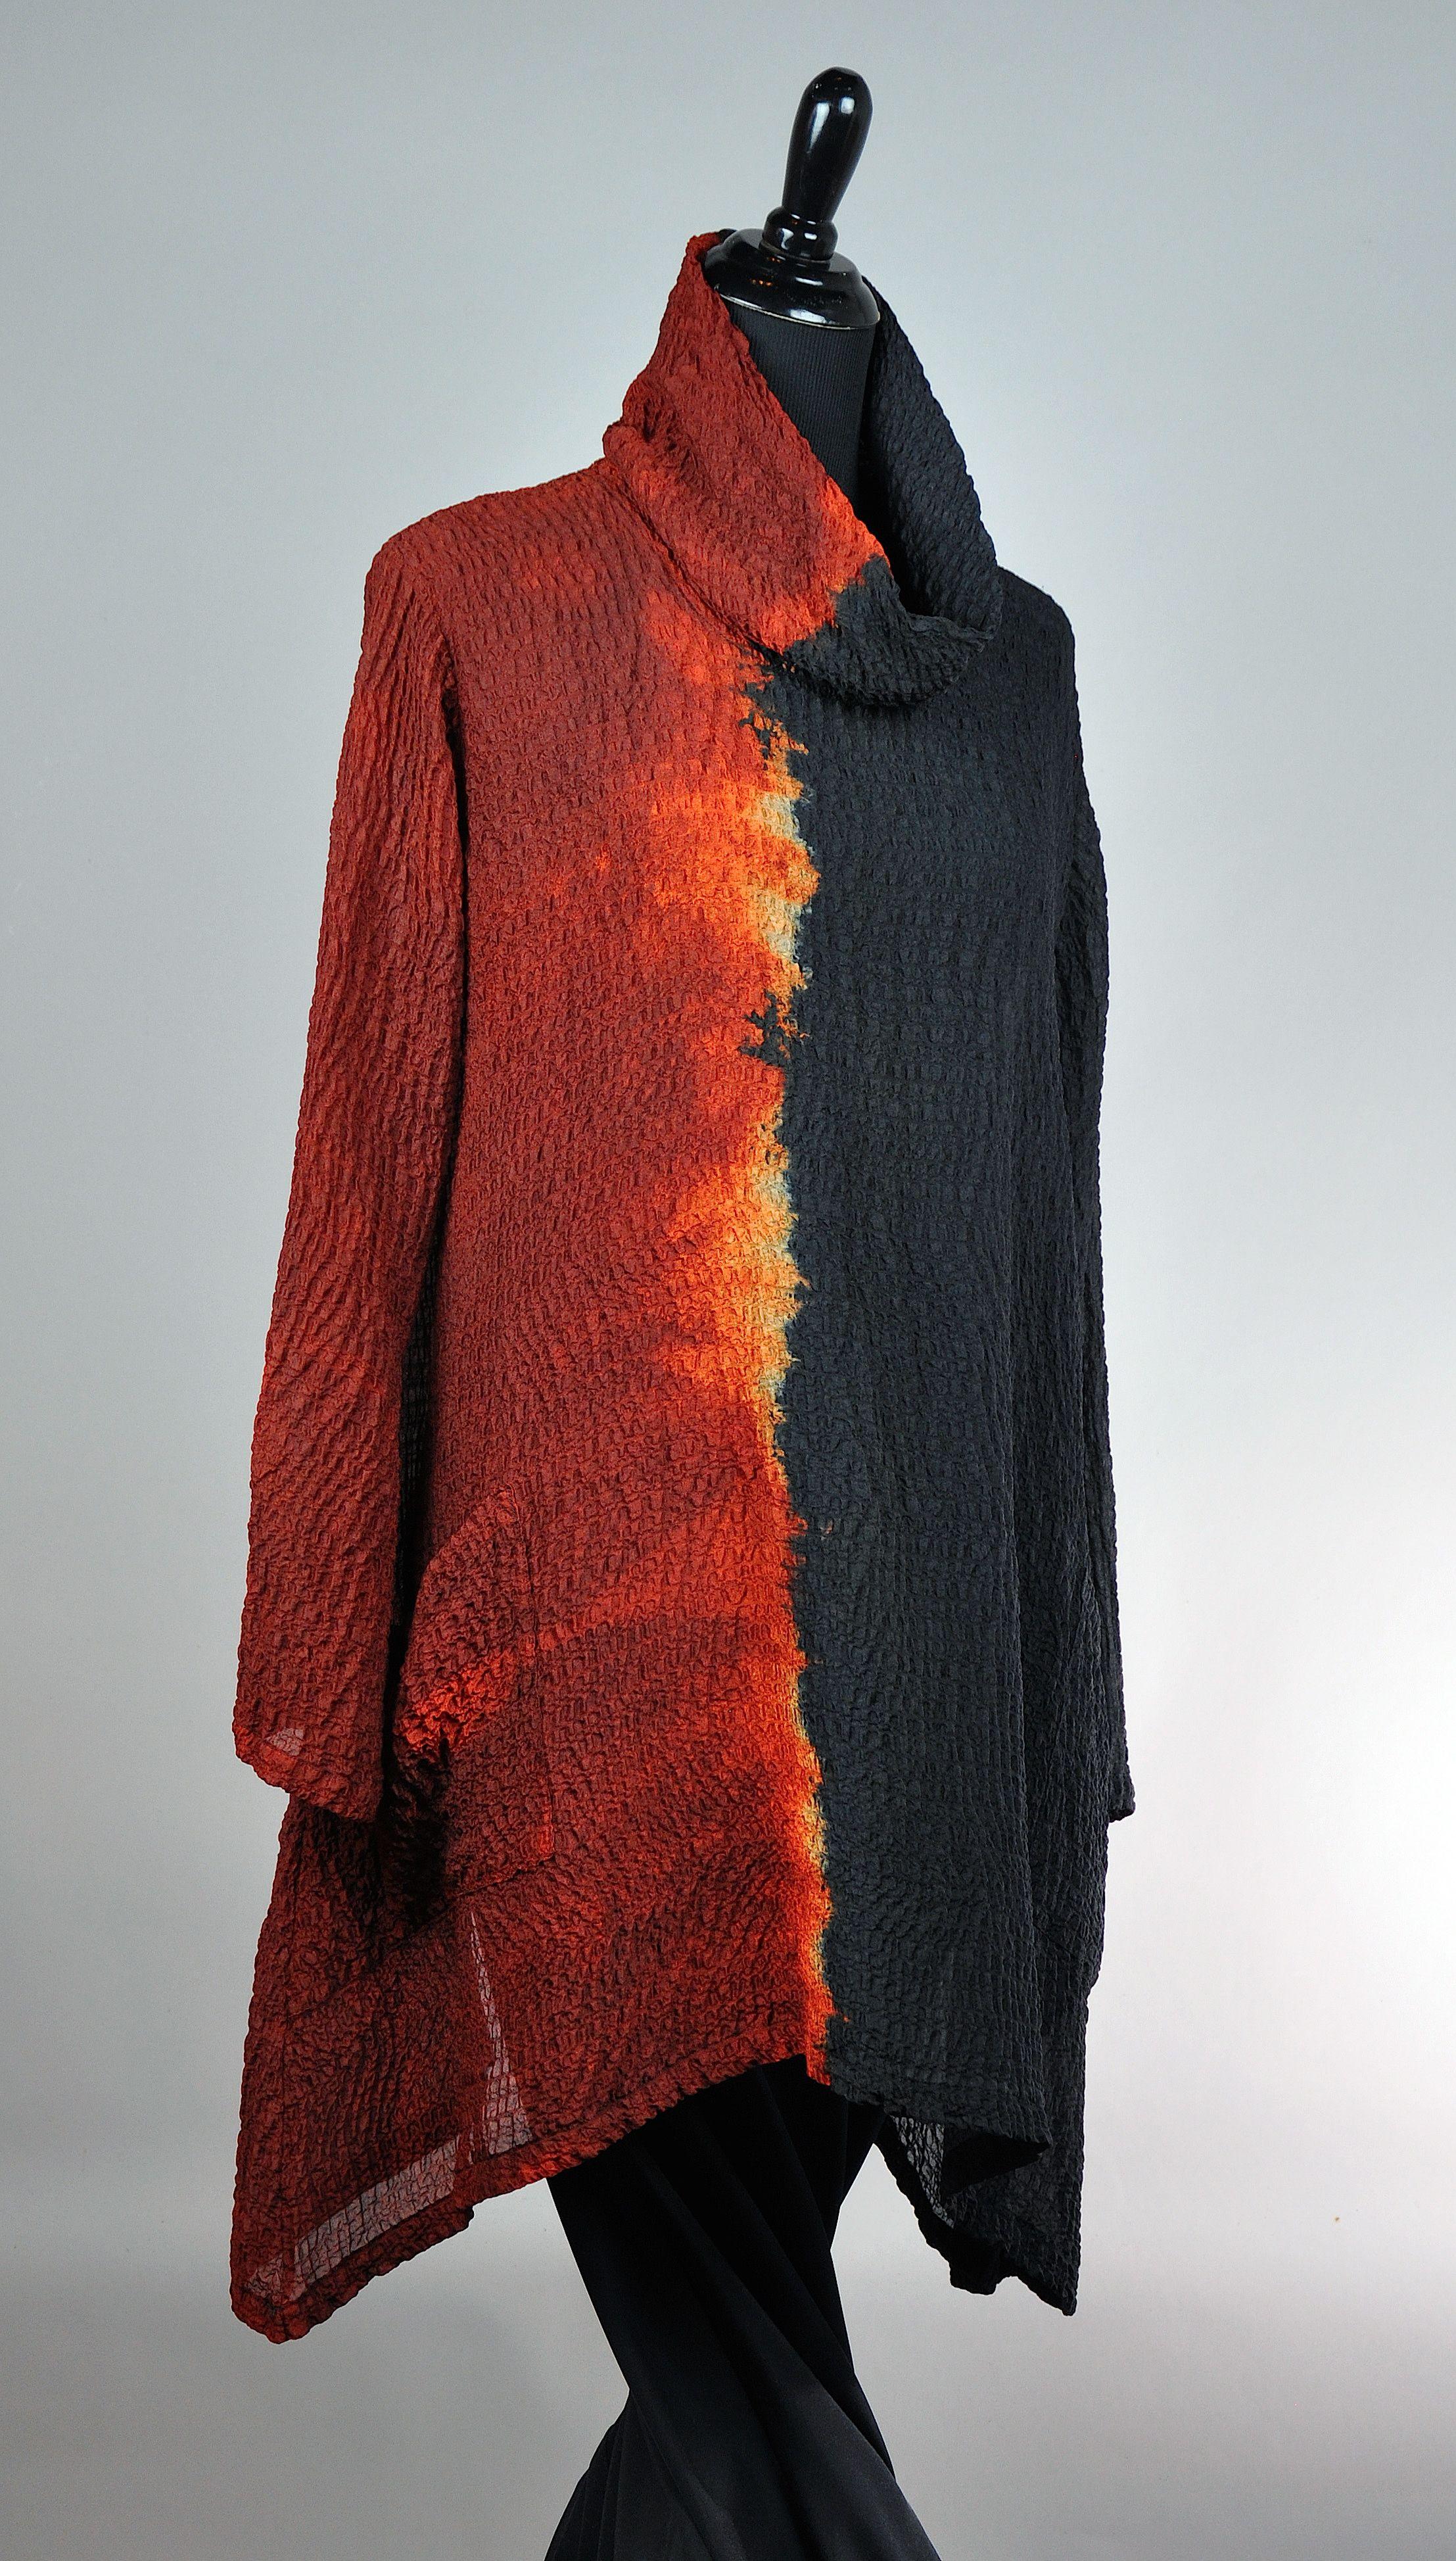 Medium Cowl neck Pocket Pullover Red Black, silk bubble Gauze SOLD Carolina Artisans Market ... will be available on Artful Home Soon